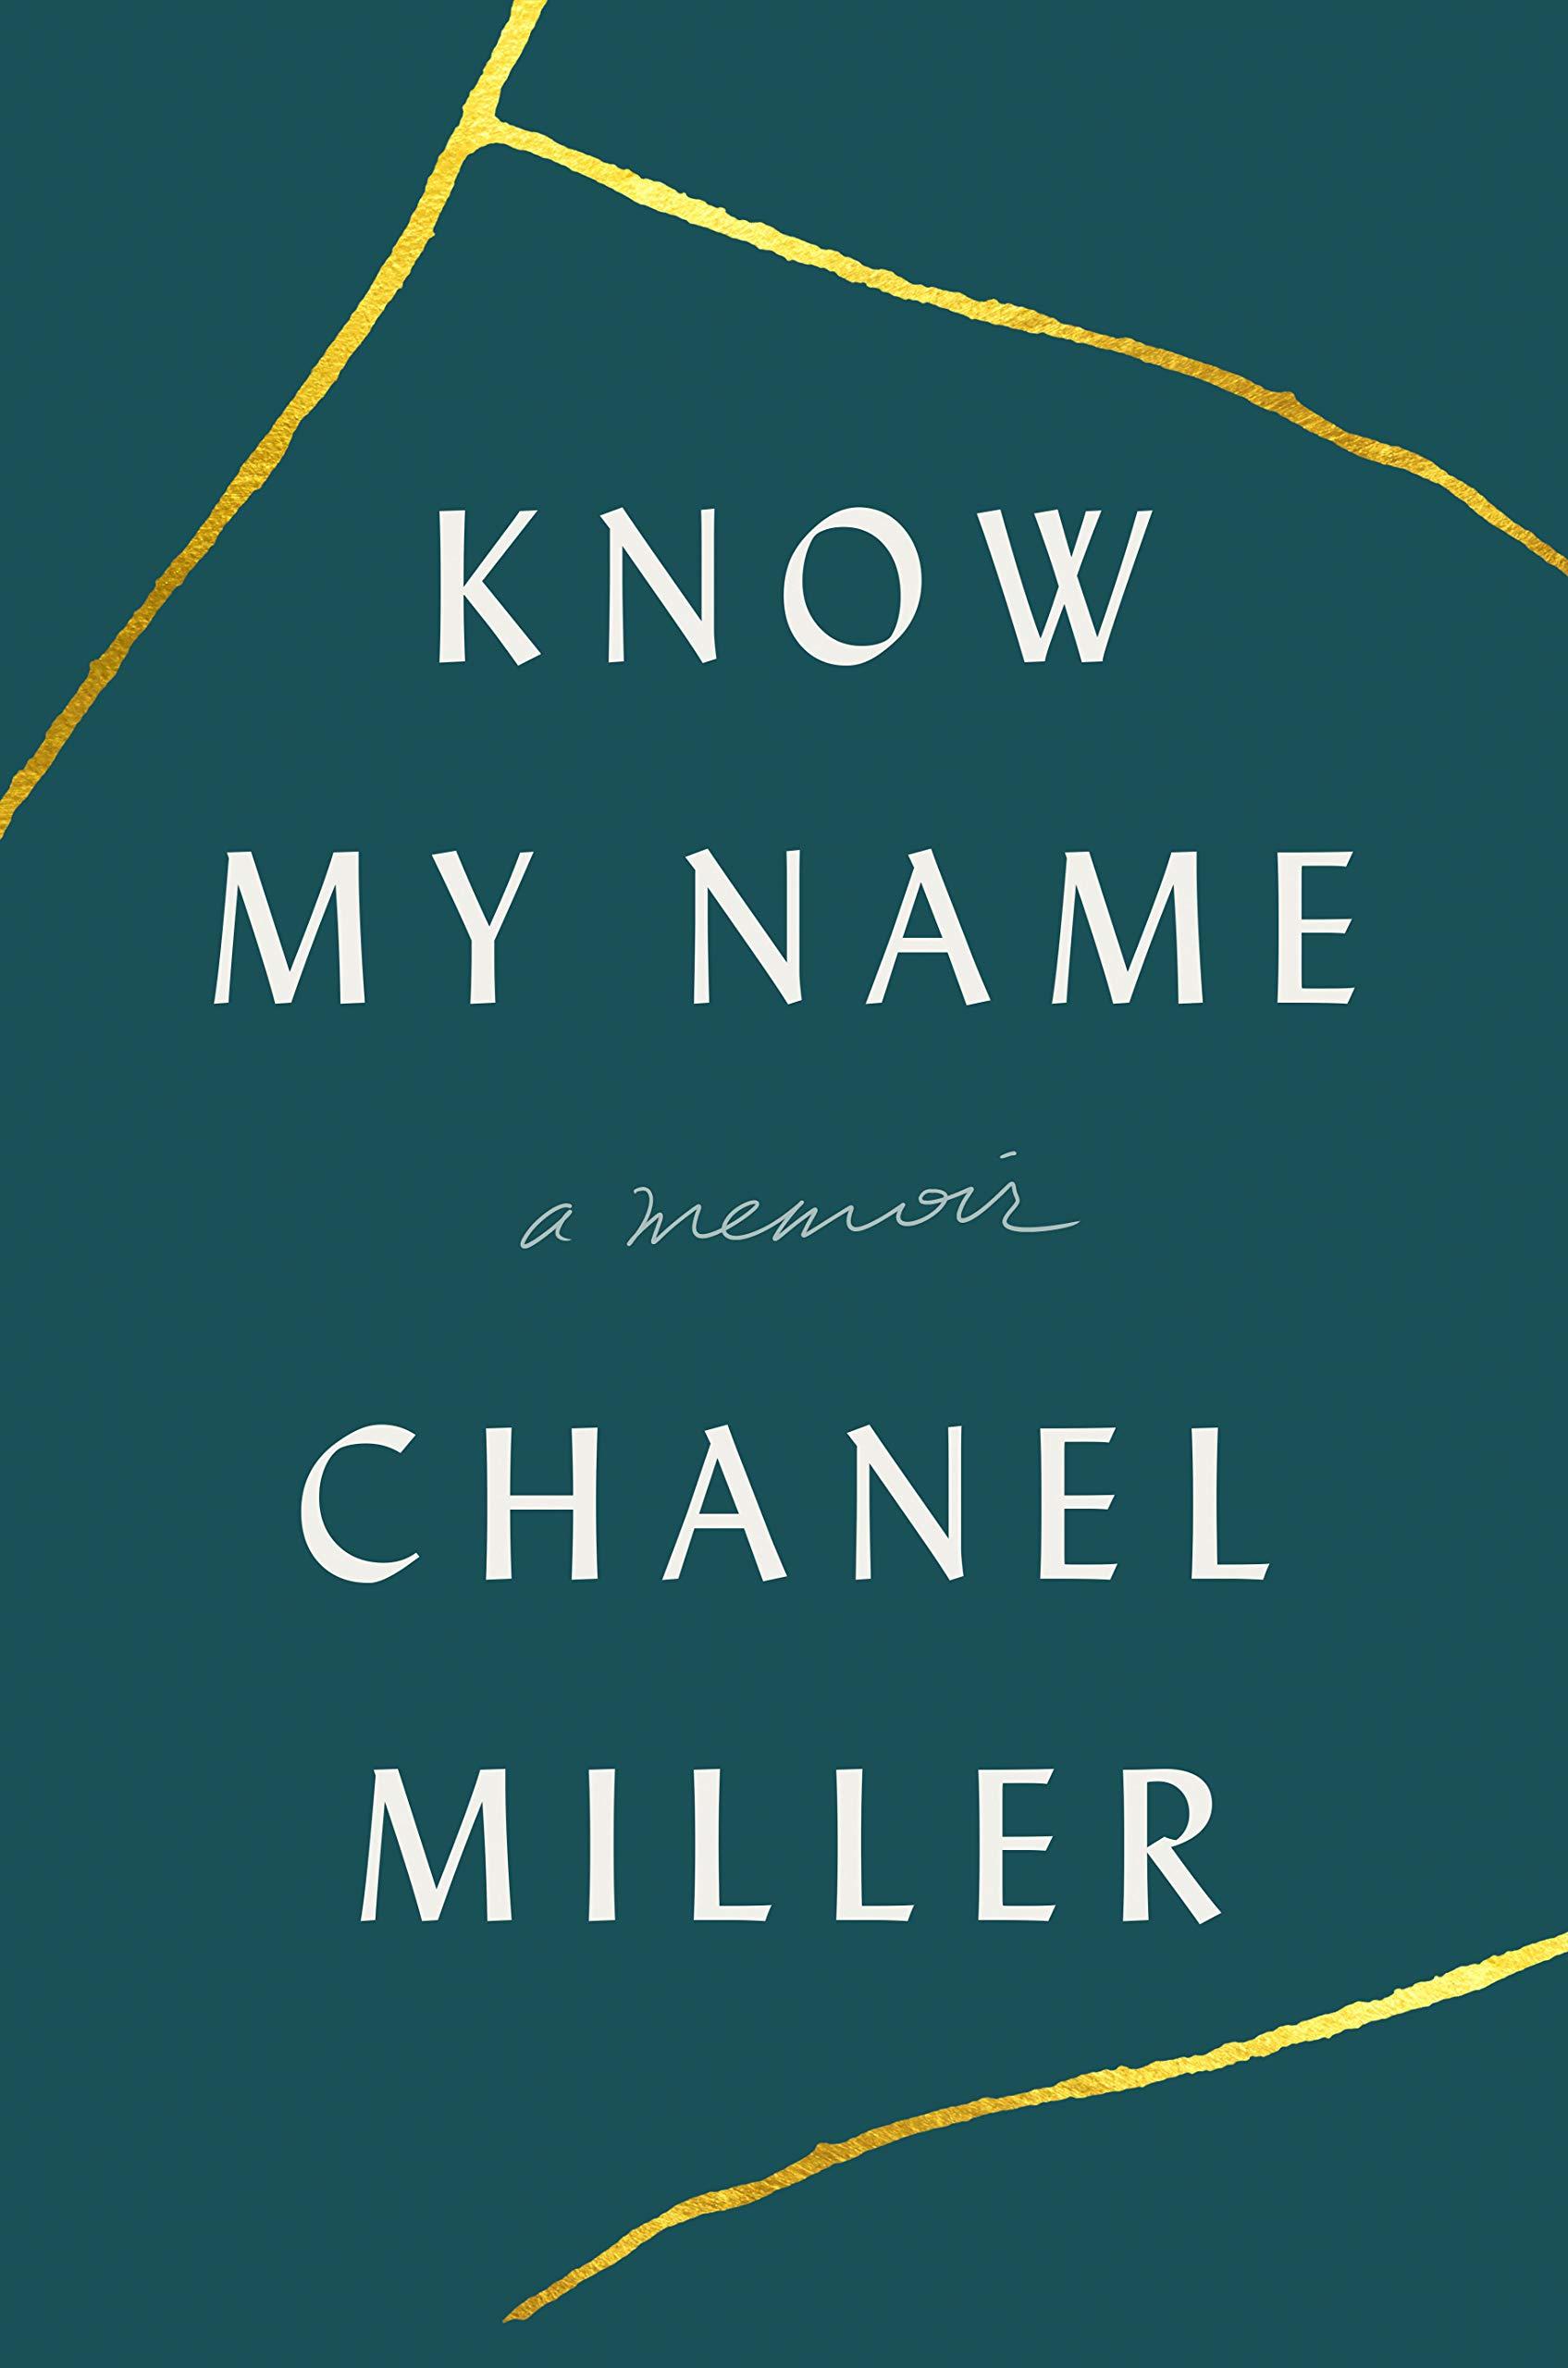 Know My Name: A Memoir by Viking